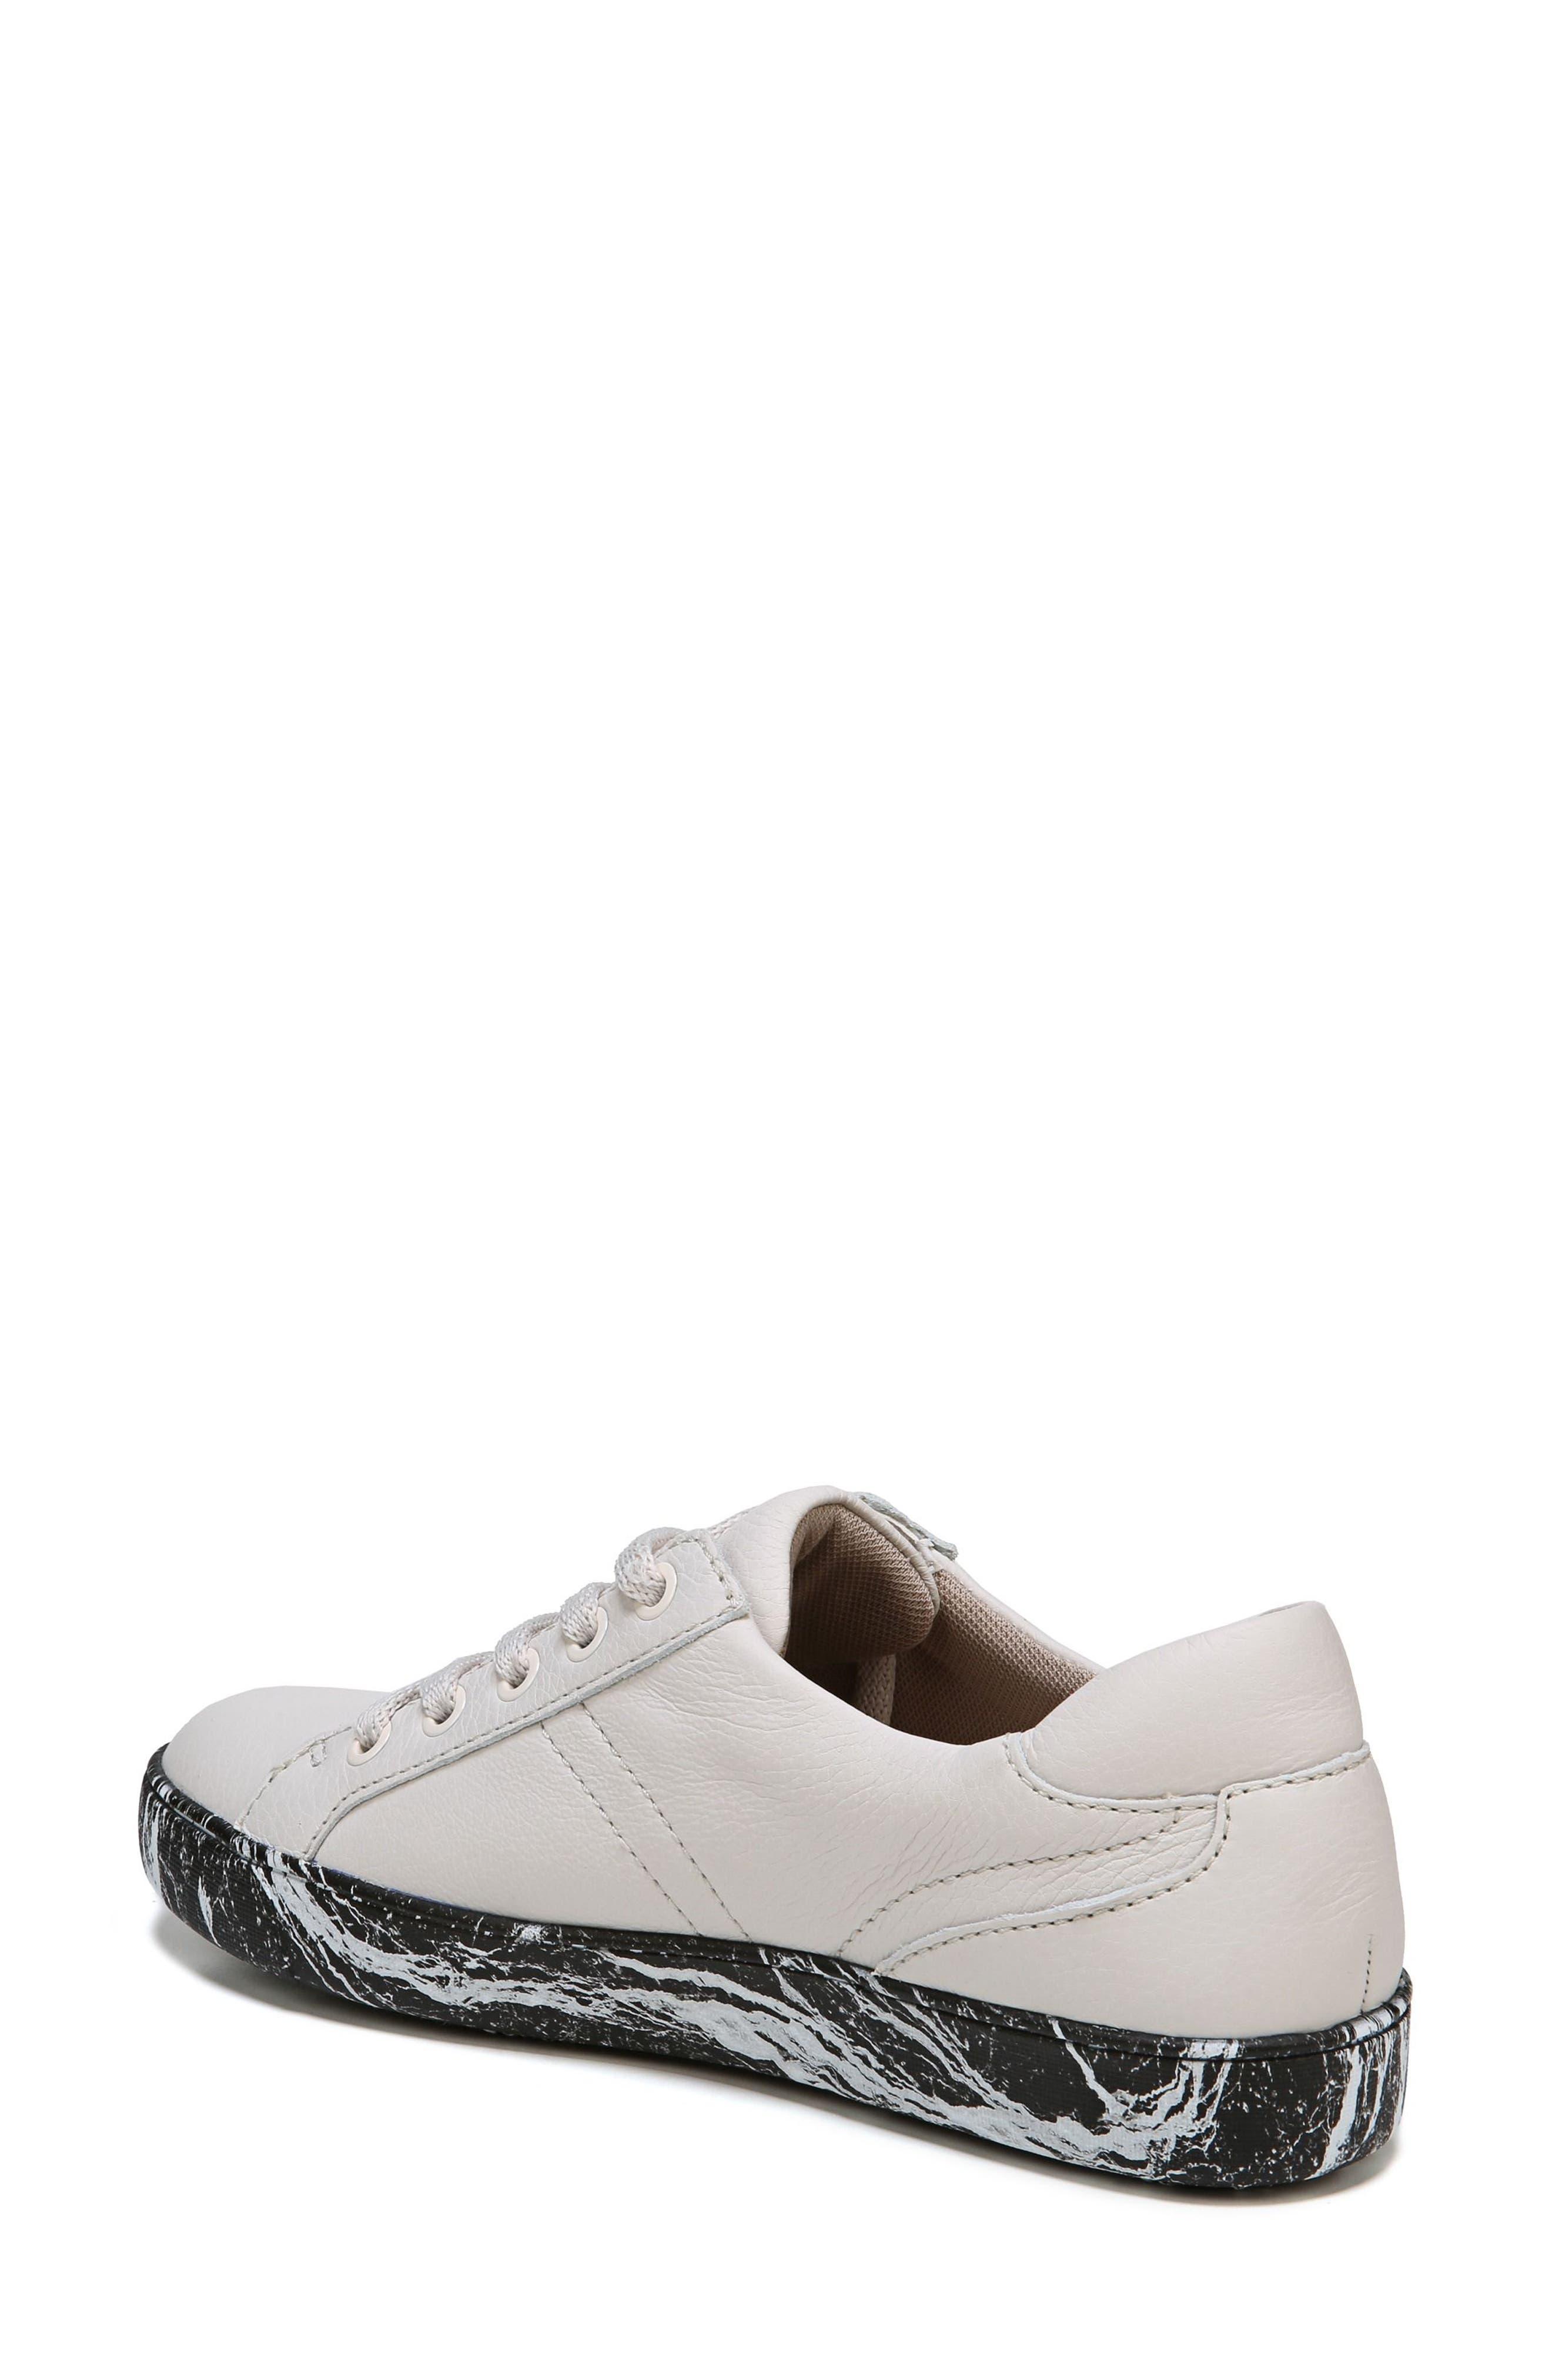 Morrison Sneaker,                             Alternate thumbnail 4, color,                             Beige Pebble Leather